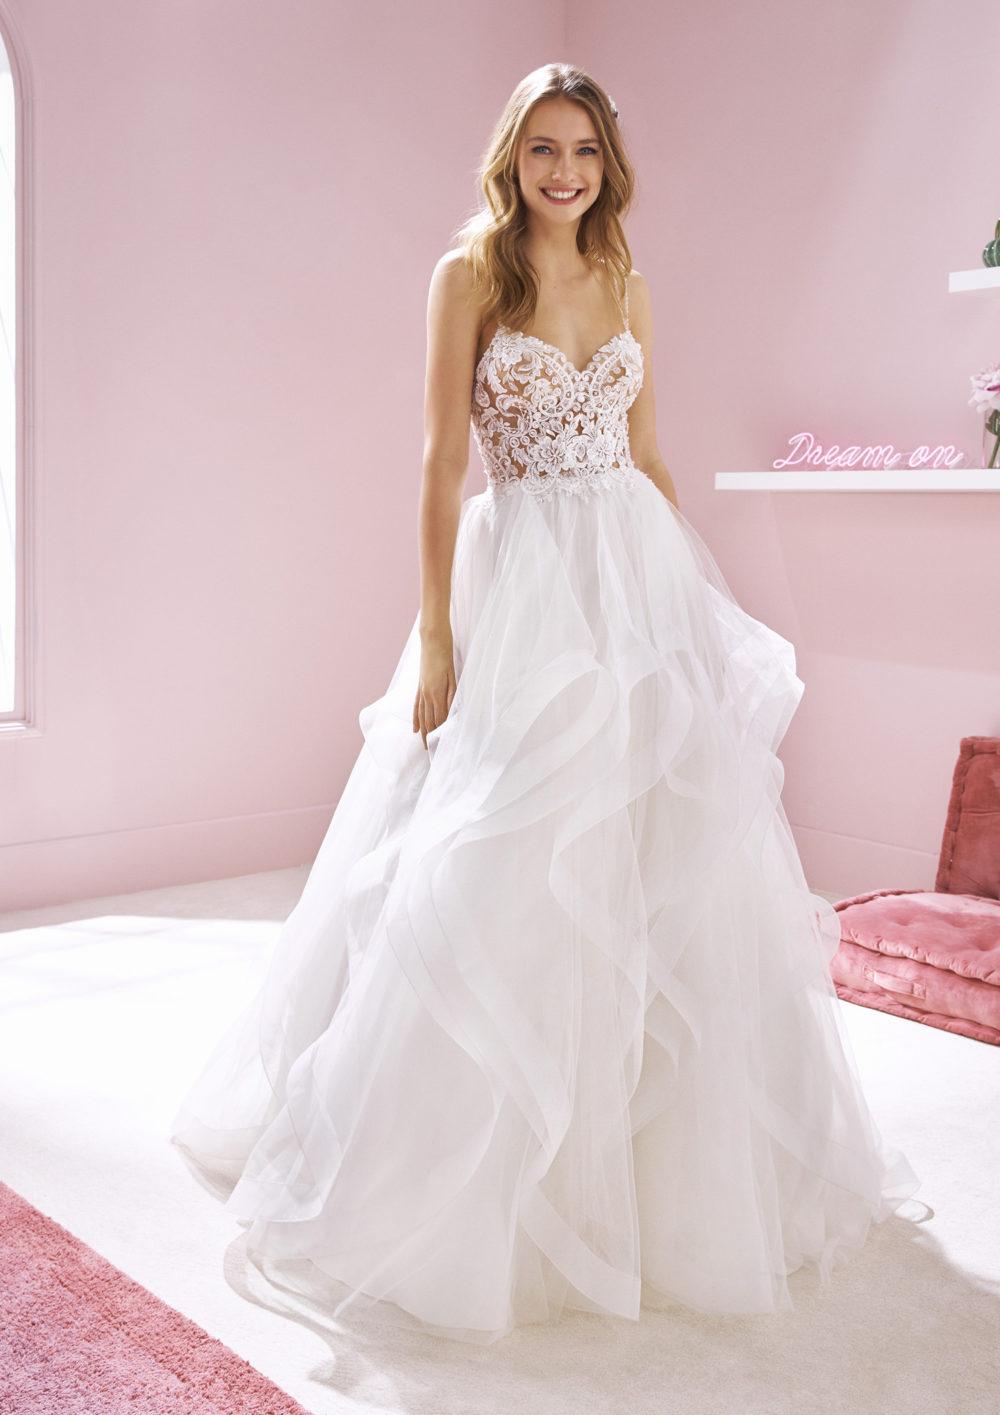 Mariages: abito da sposa Poème 2020 a Vicenza, Verona, Padova, Veneto RINA